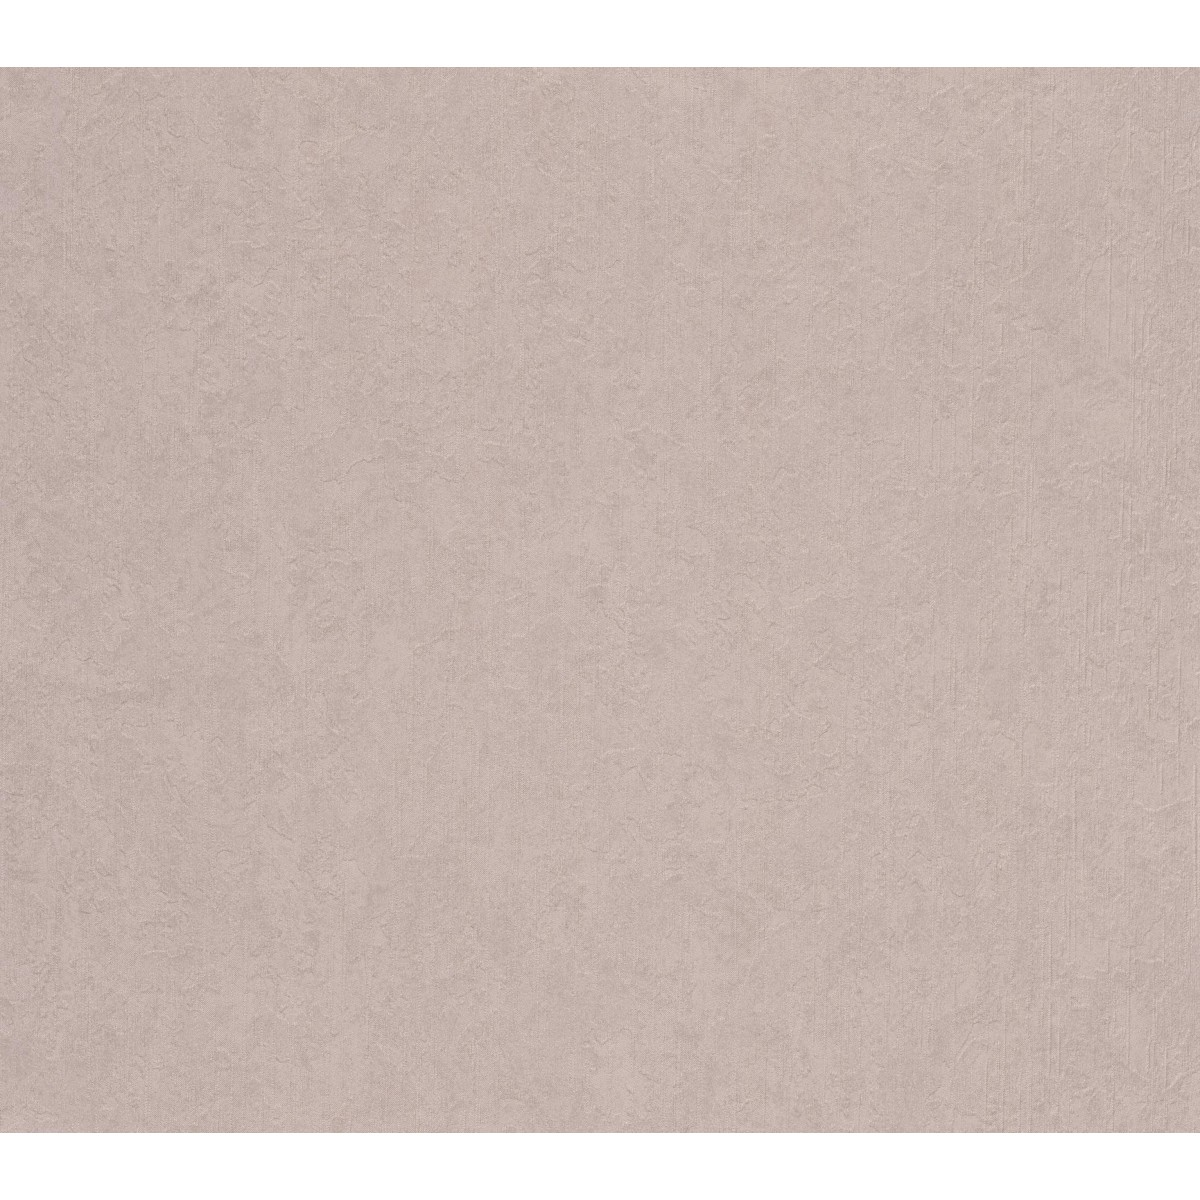 Обои флизелиновые Limonta Italian Wall Couture Camea бежевые 1.06 м 77806